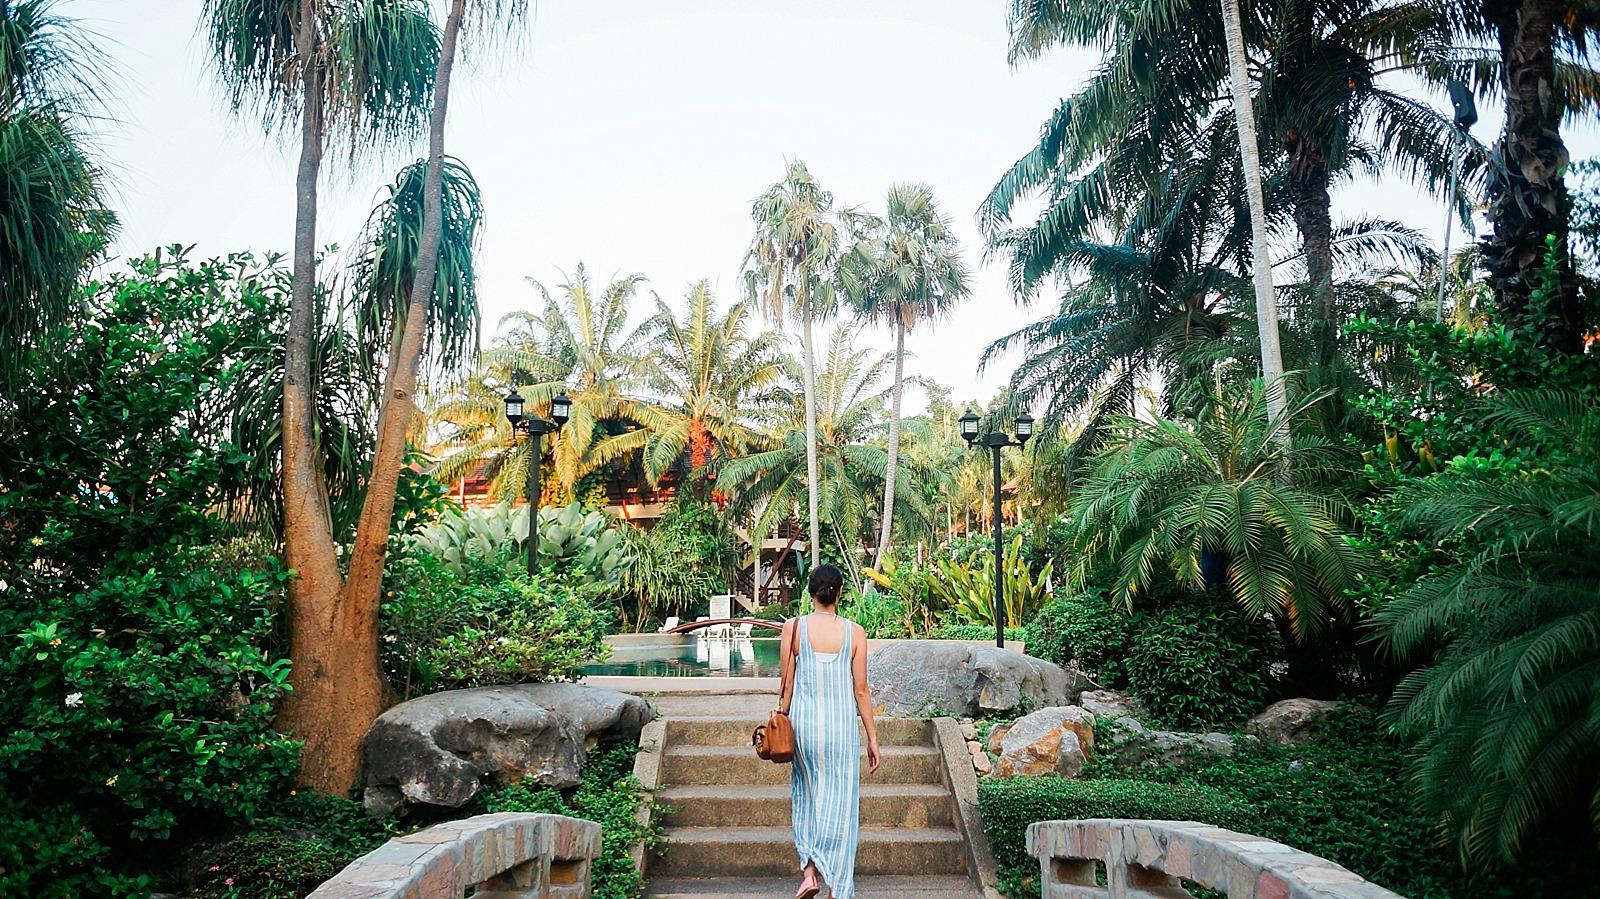 Thailand-diana-elizabeth-travel-blogger-phoenix-296